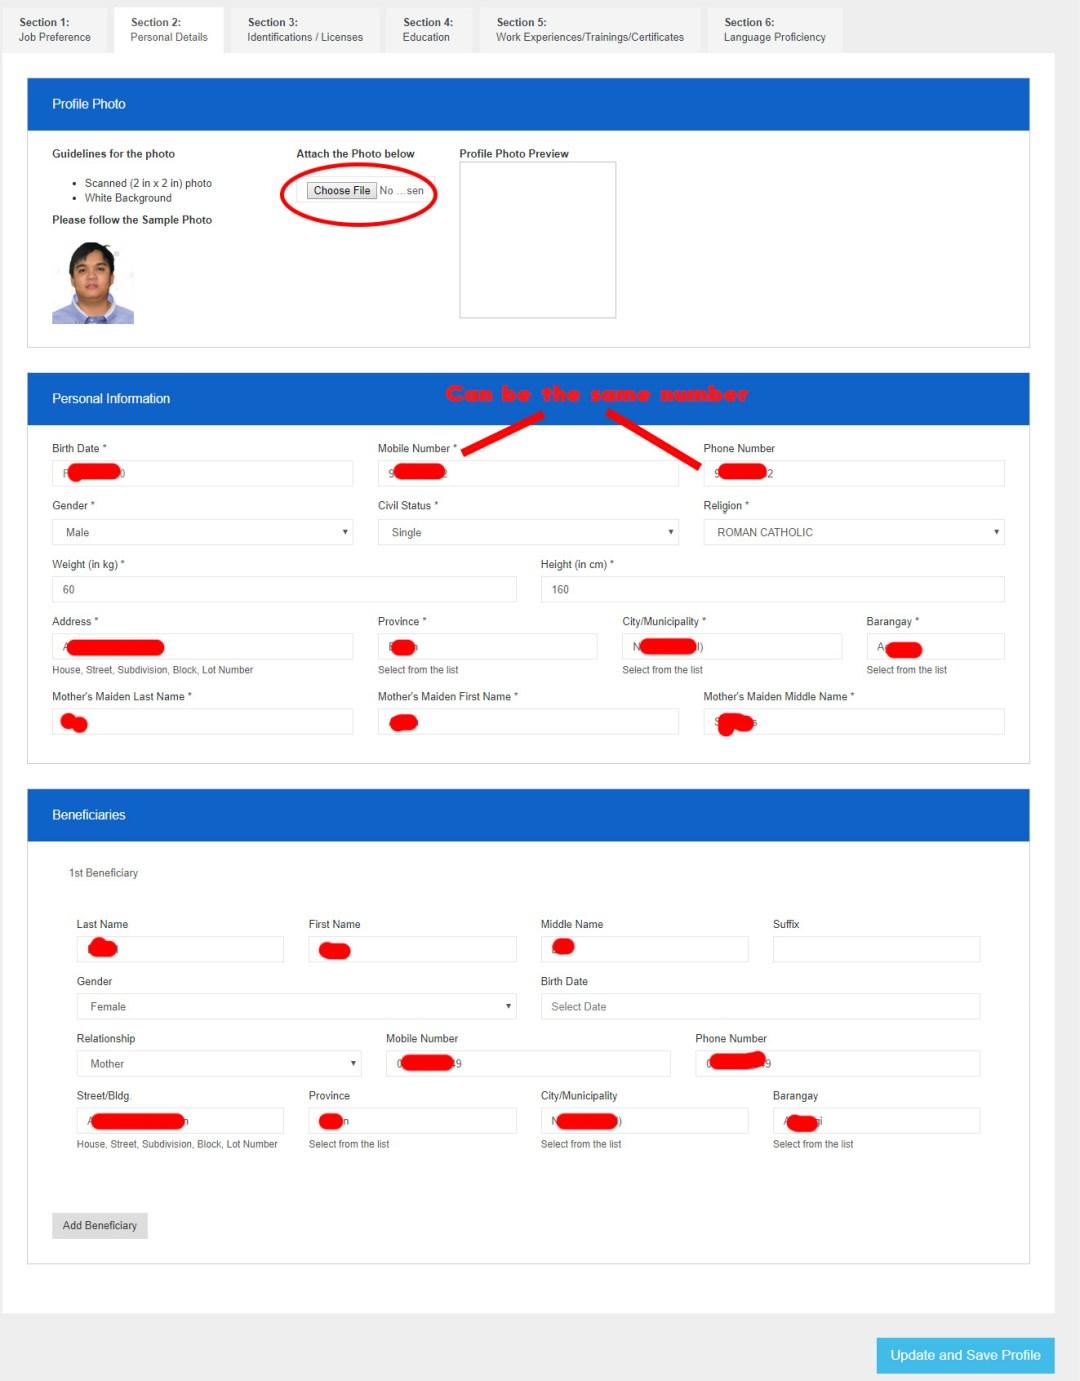 POEA e-registration Sample: Section 2 - Personal Details